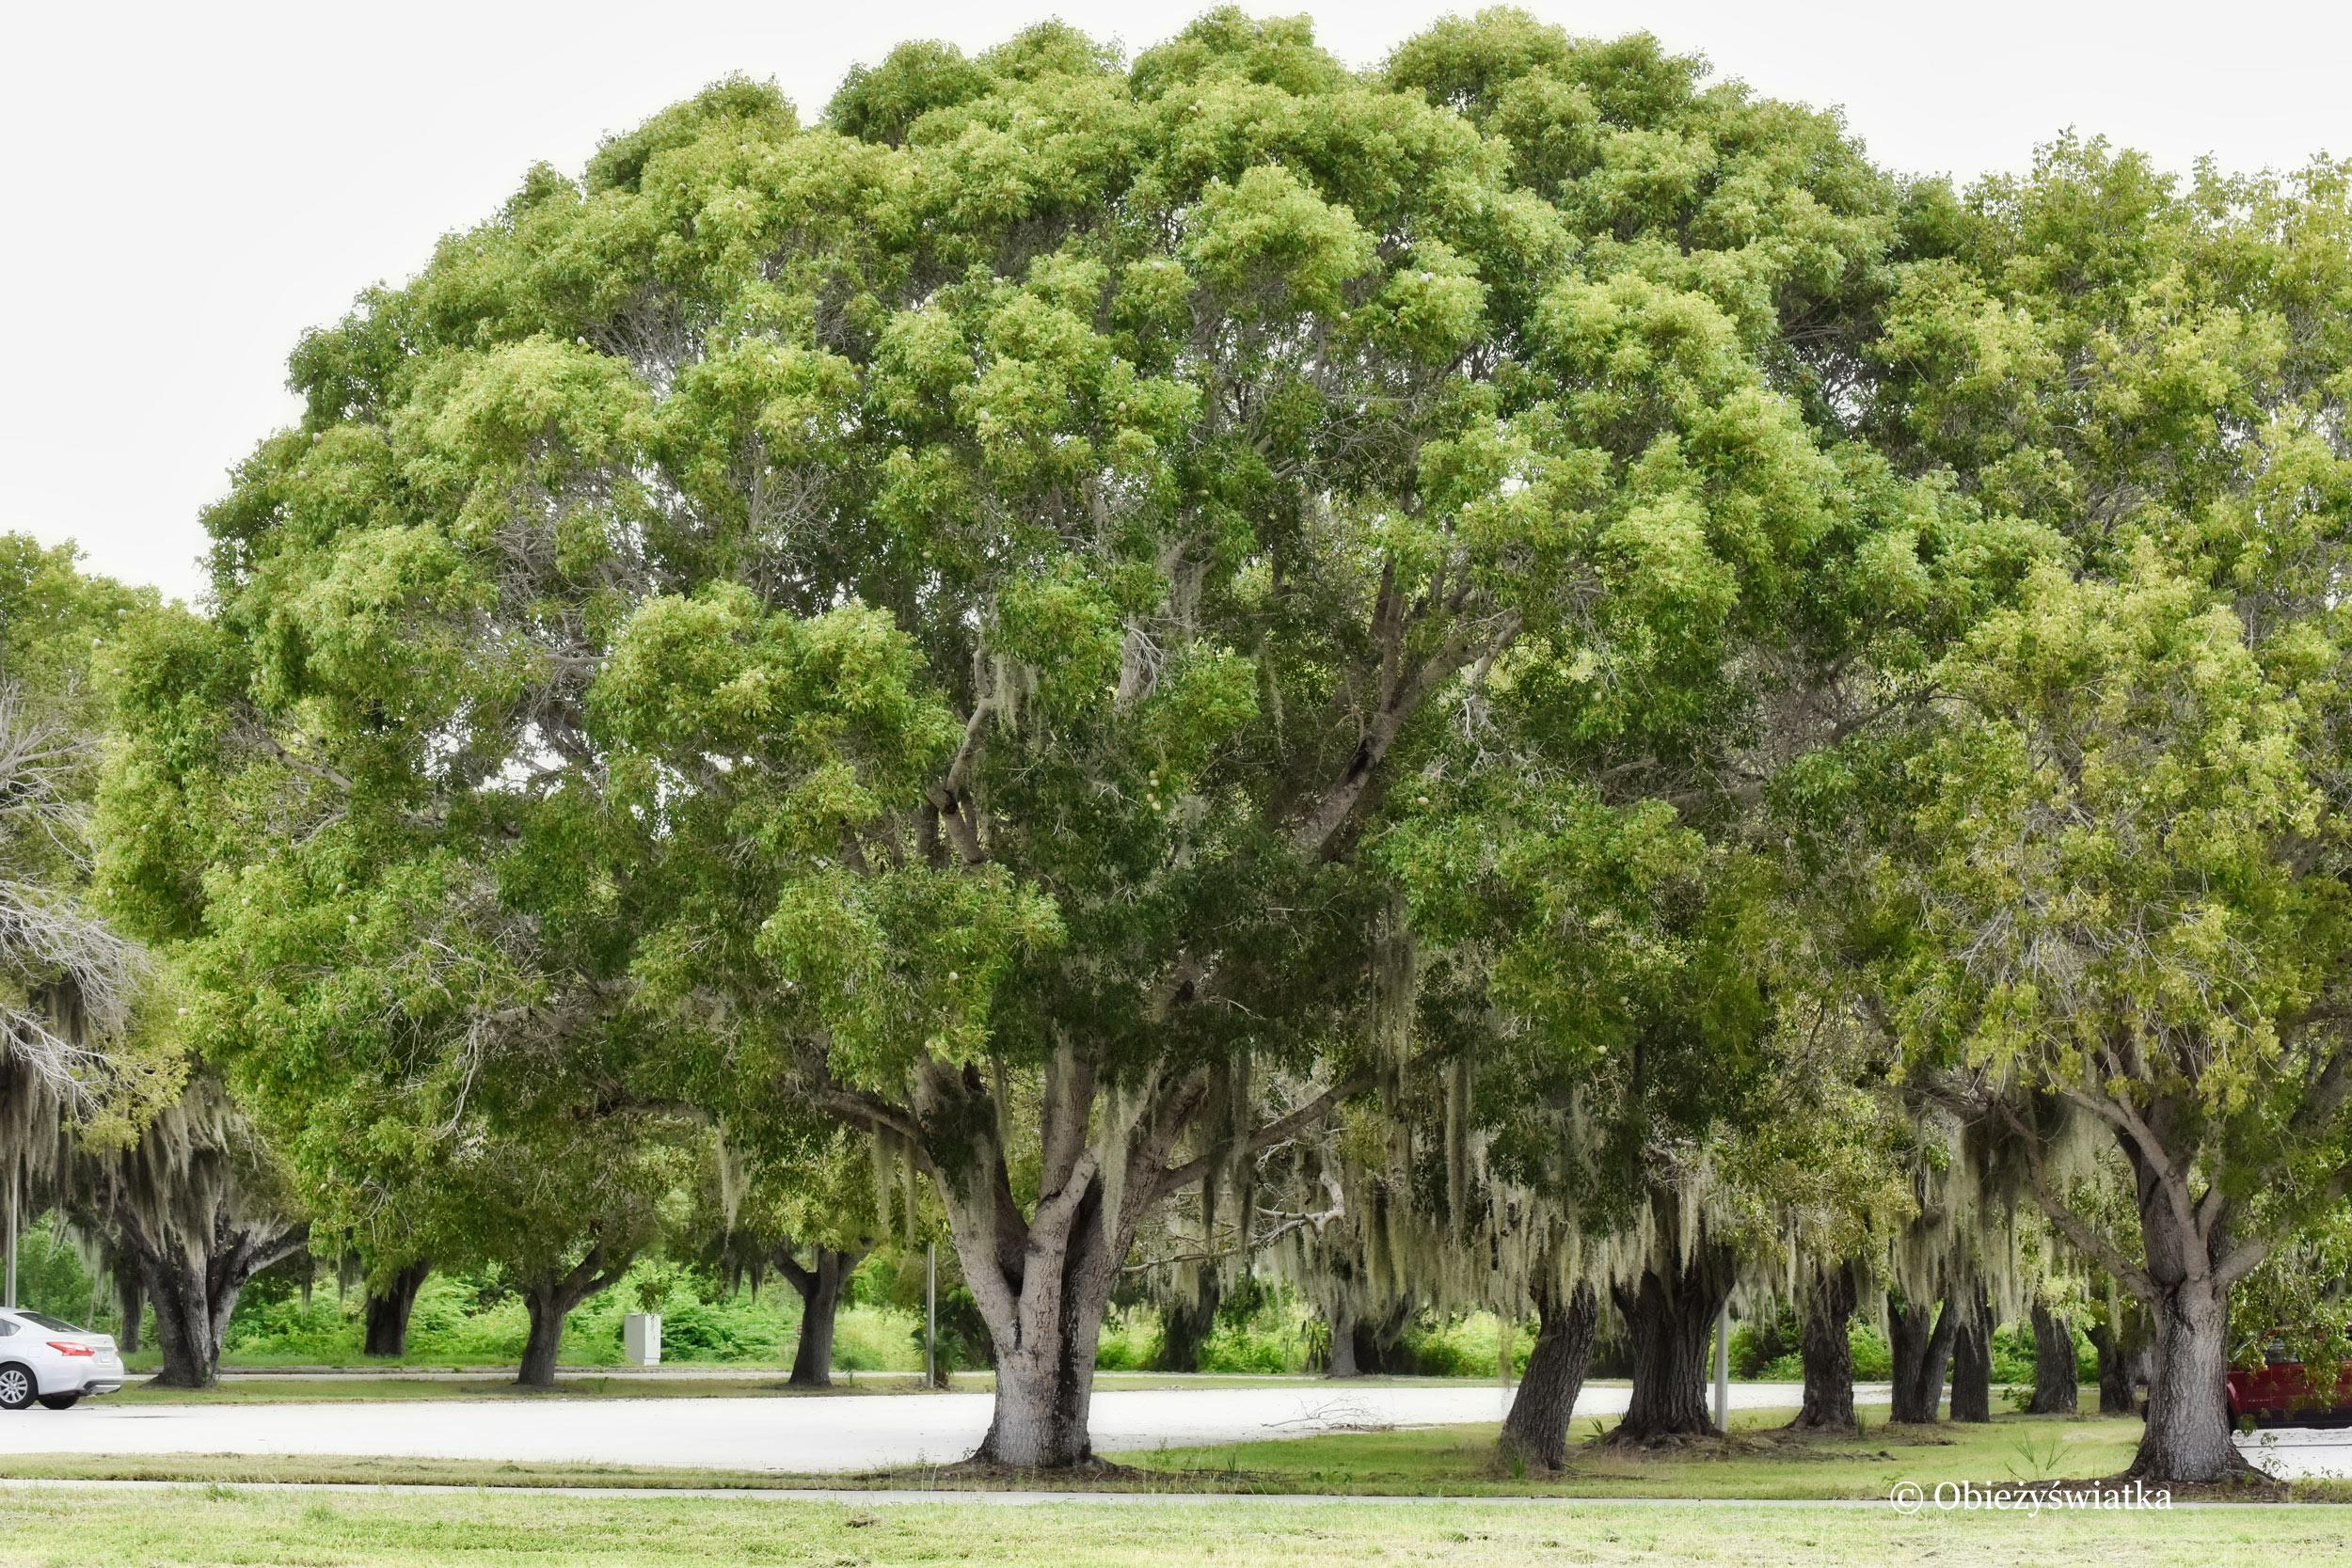 Drzewa otulone hiszpańskim mchem, USA